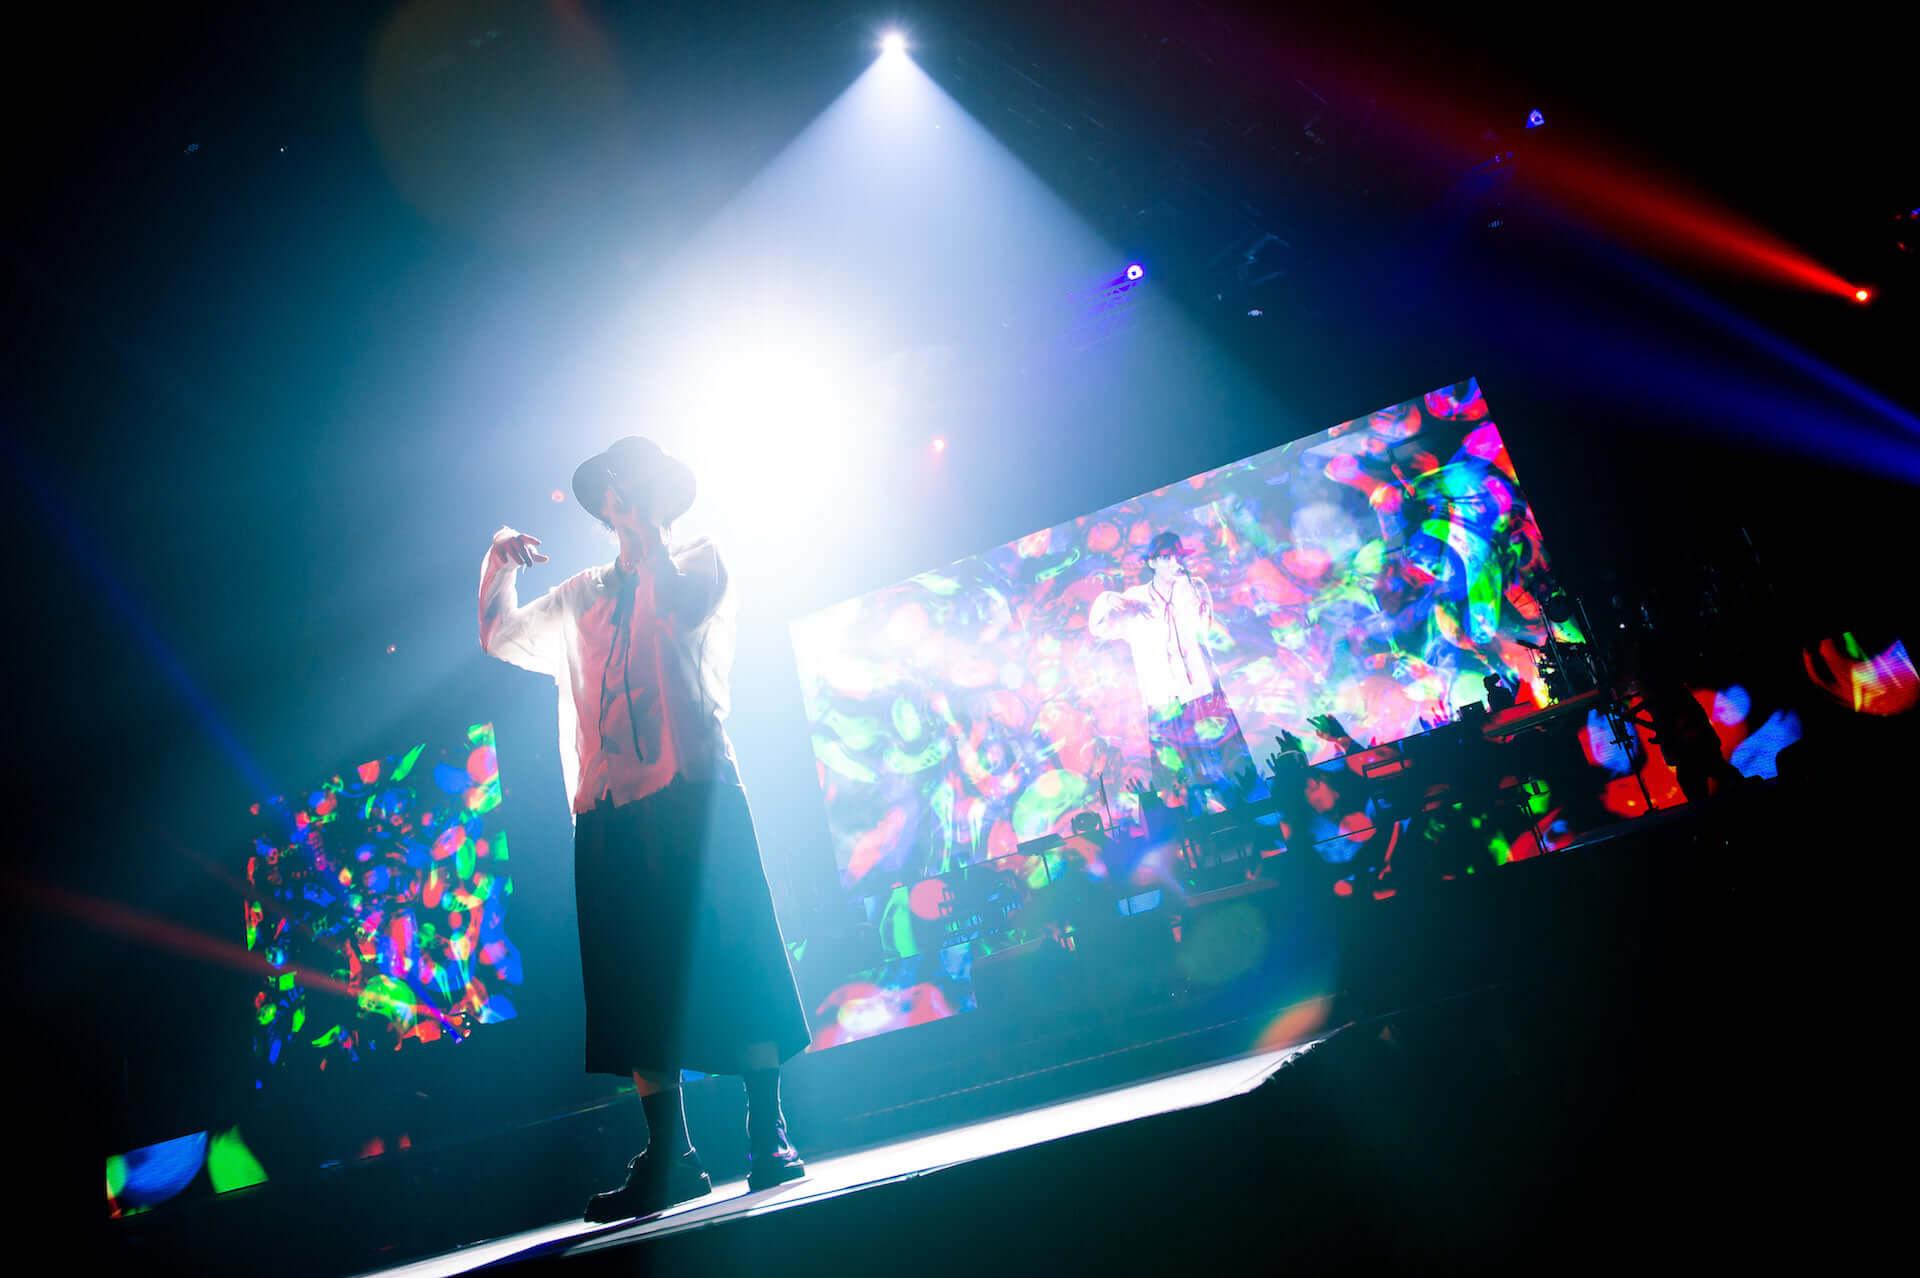 RADWIMPS横浜アリーナ公演のライブ写真が公開!<ANTI ANTI GENERATION TOUR 2019>レポート music190830_radwimps_live_27-1920x1278